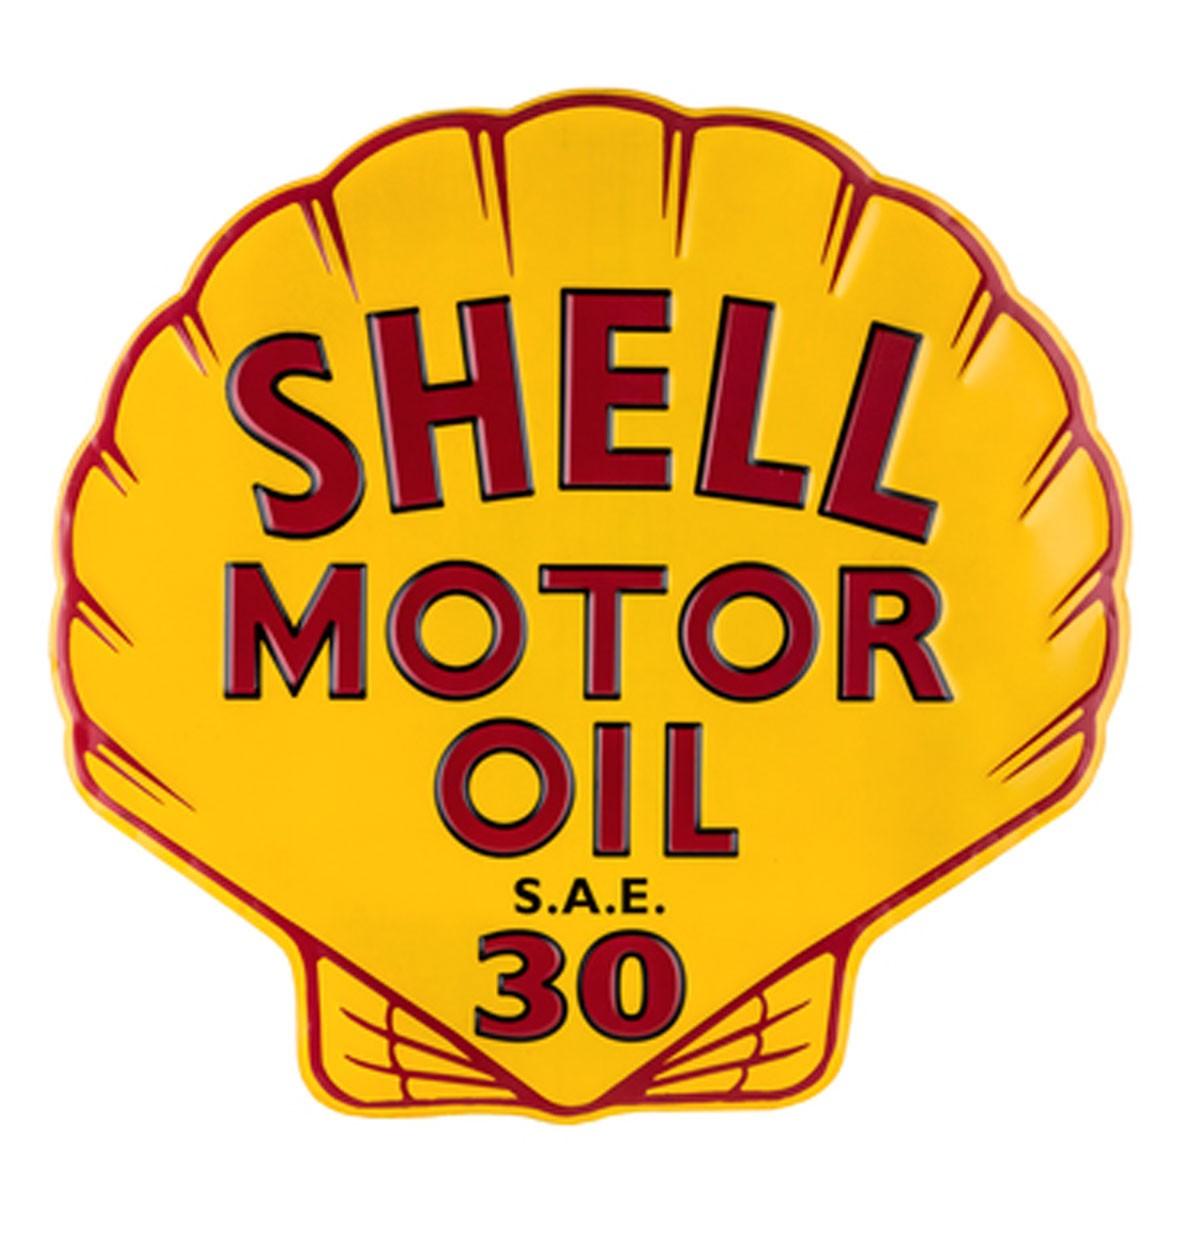 Weet alles maar eens de reutel bromfiets oldtimer club Sale on motor oil